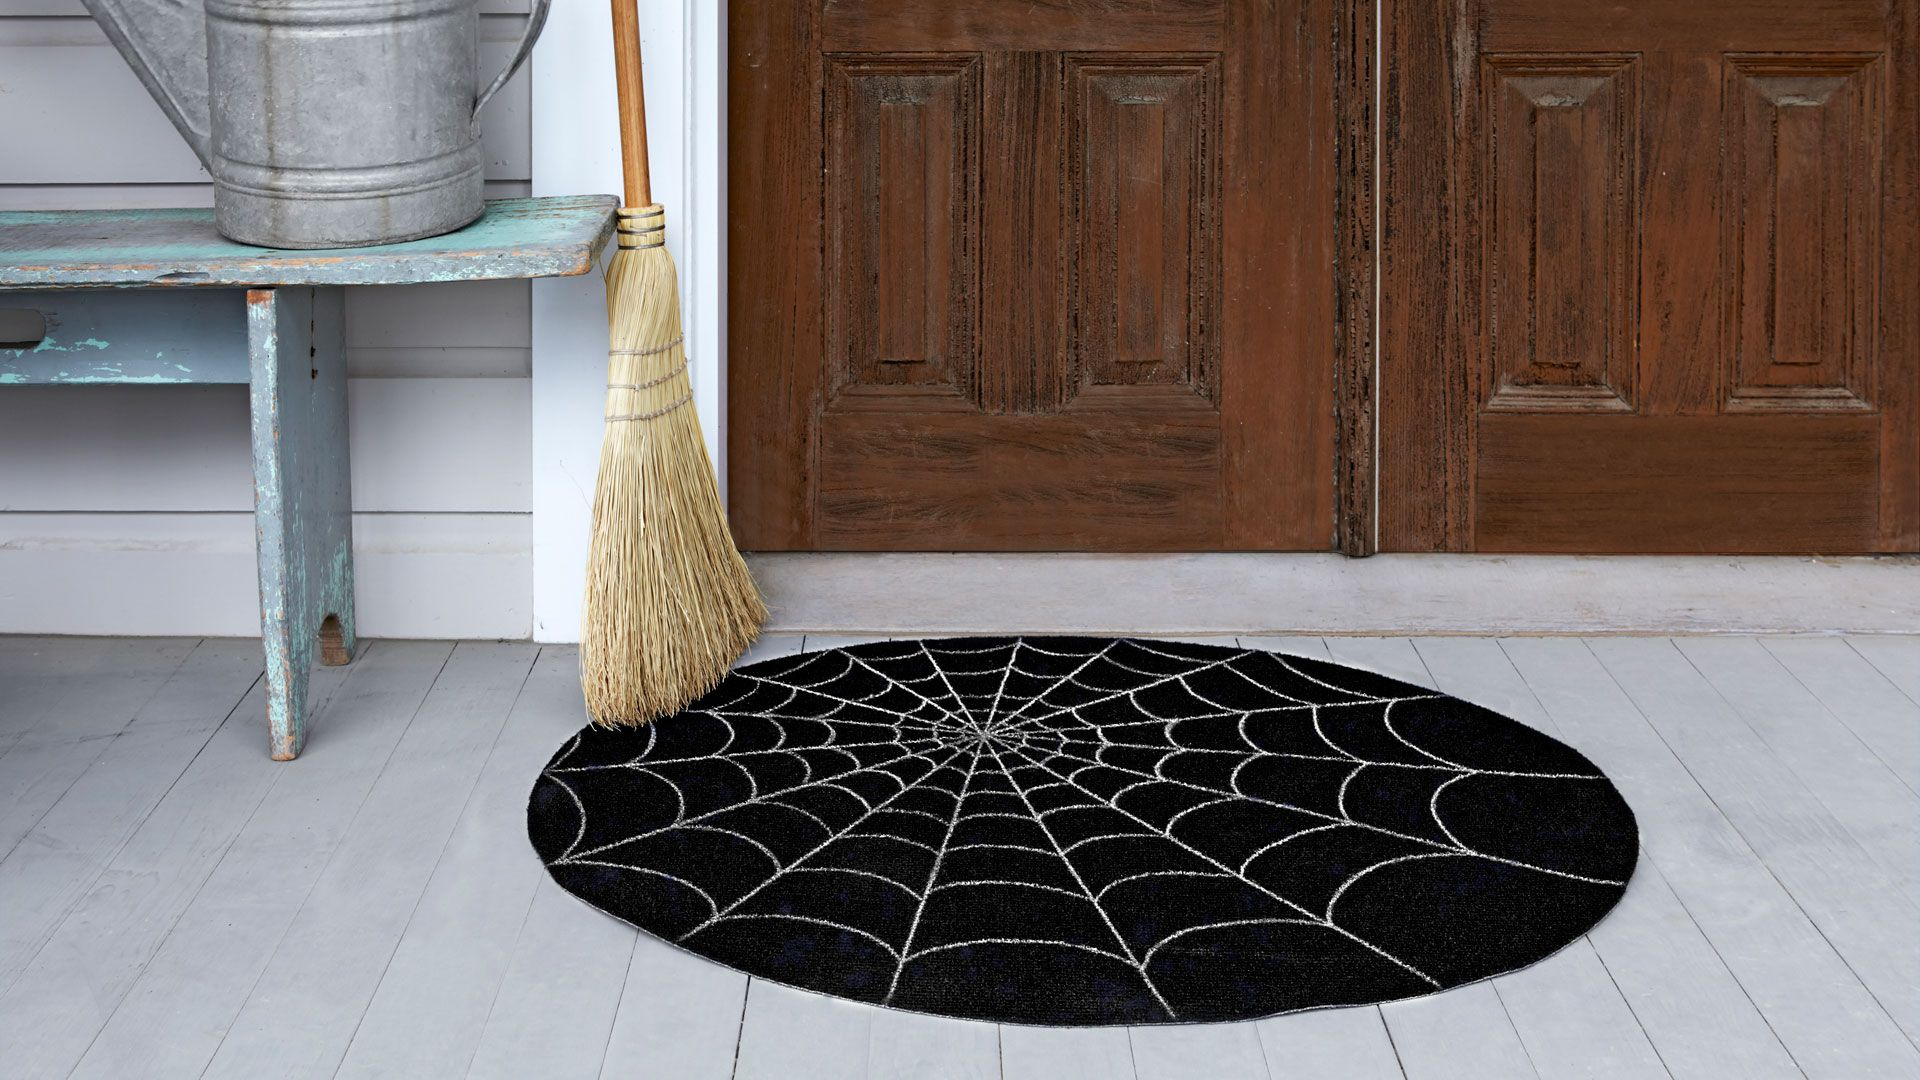 50 Best Outdoor Halloween Decorations - Easy Halloween Yard and